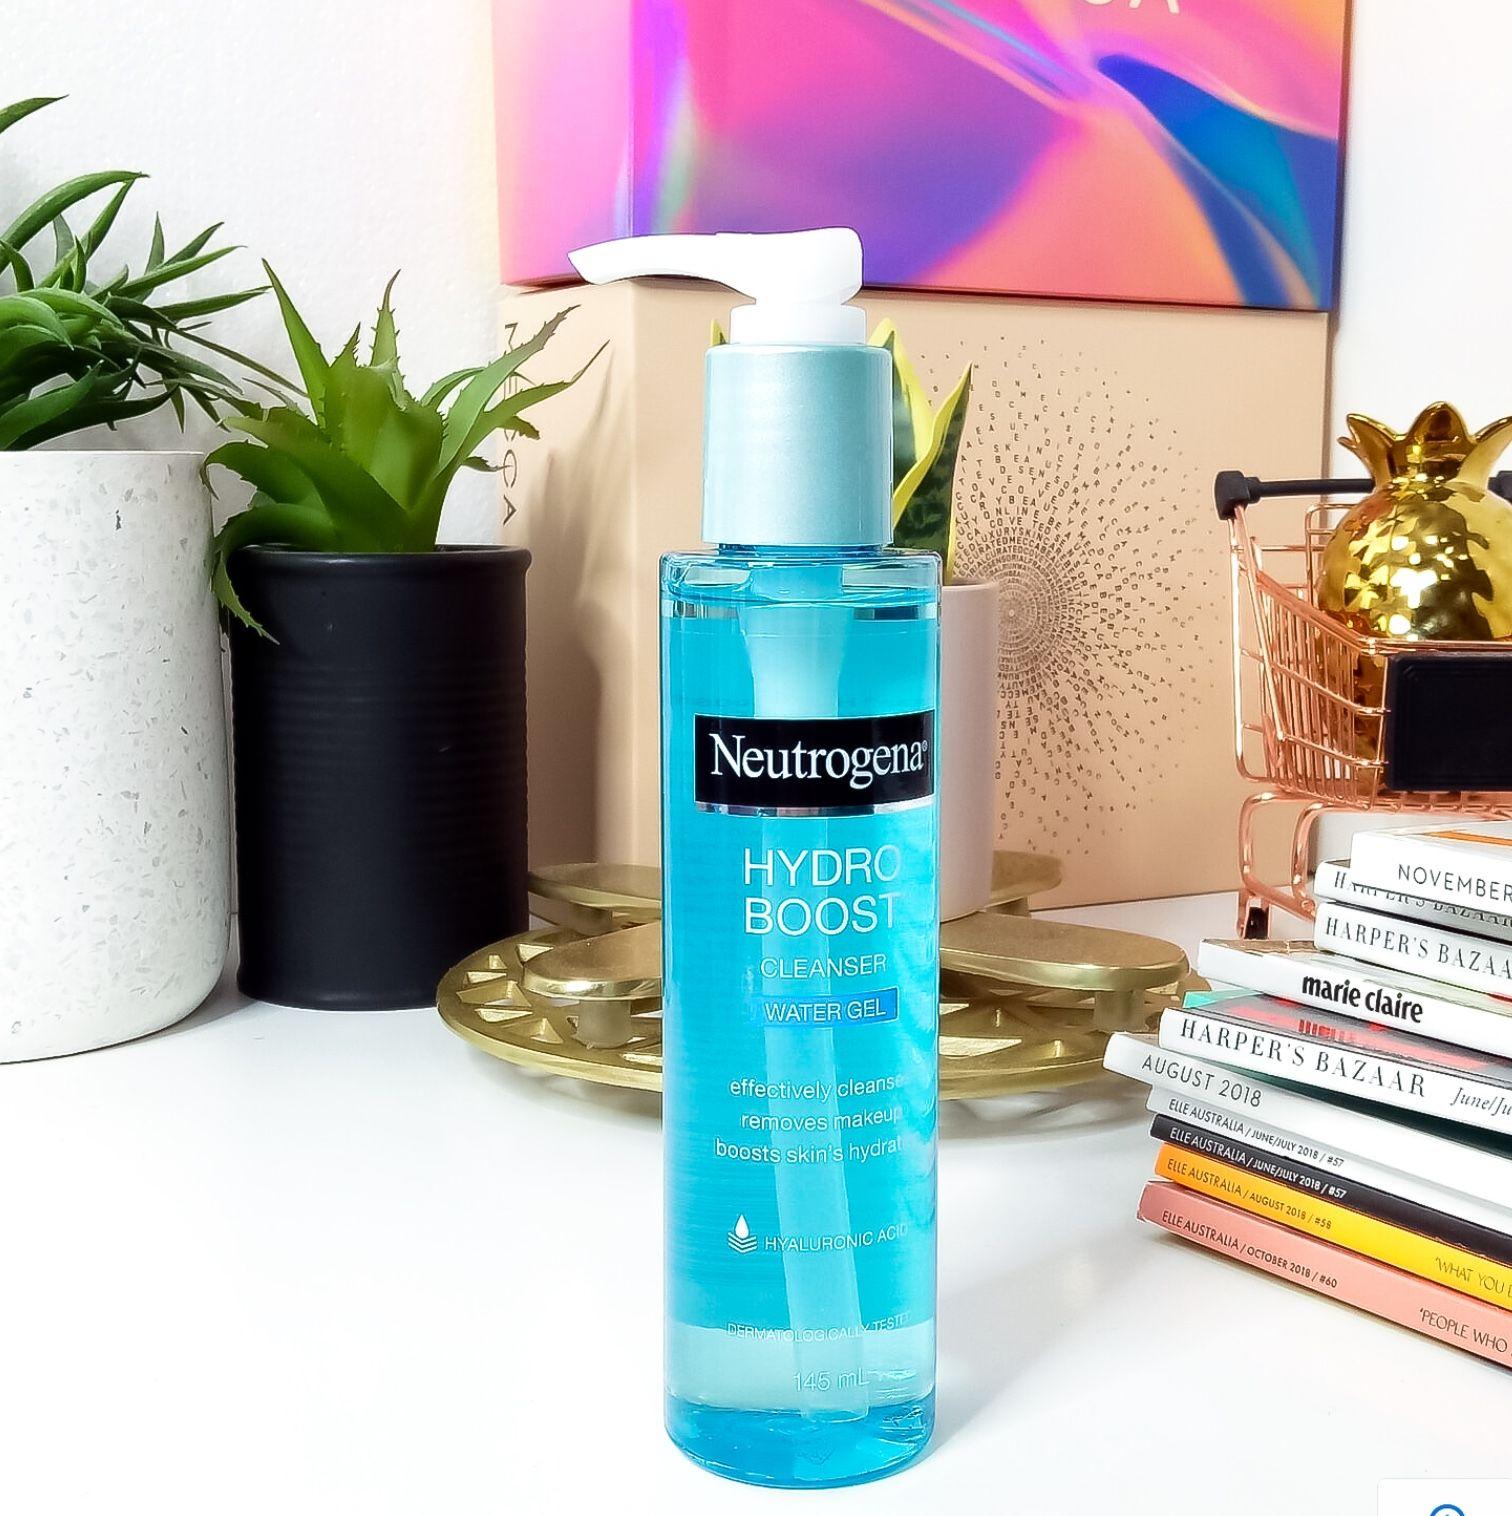 Neutrogena Hydro Boost water gel cleanser Neutrogena